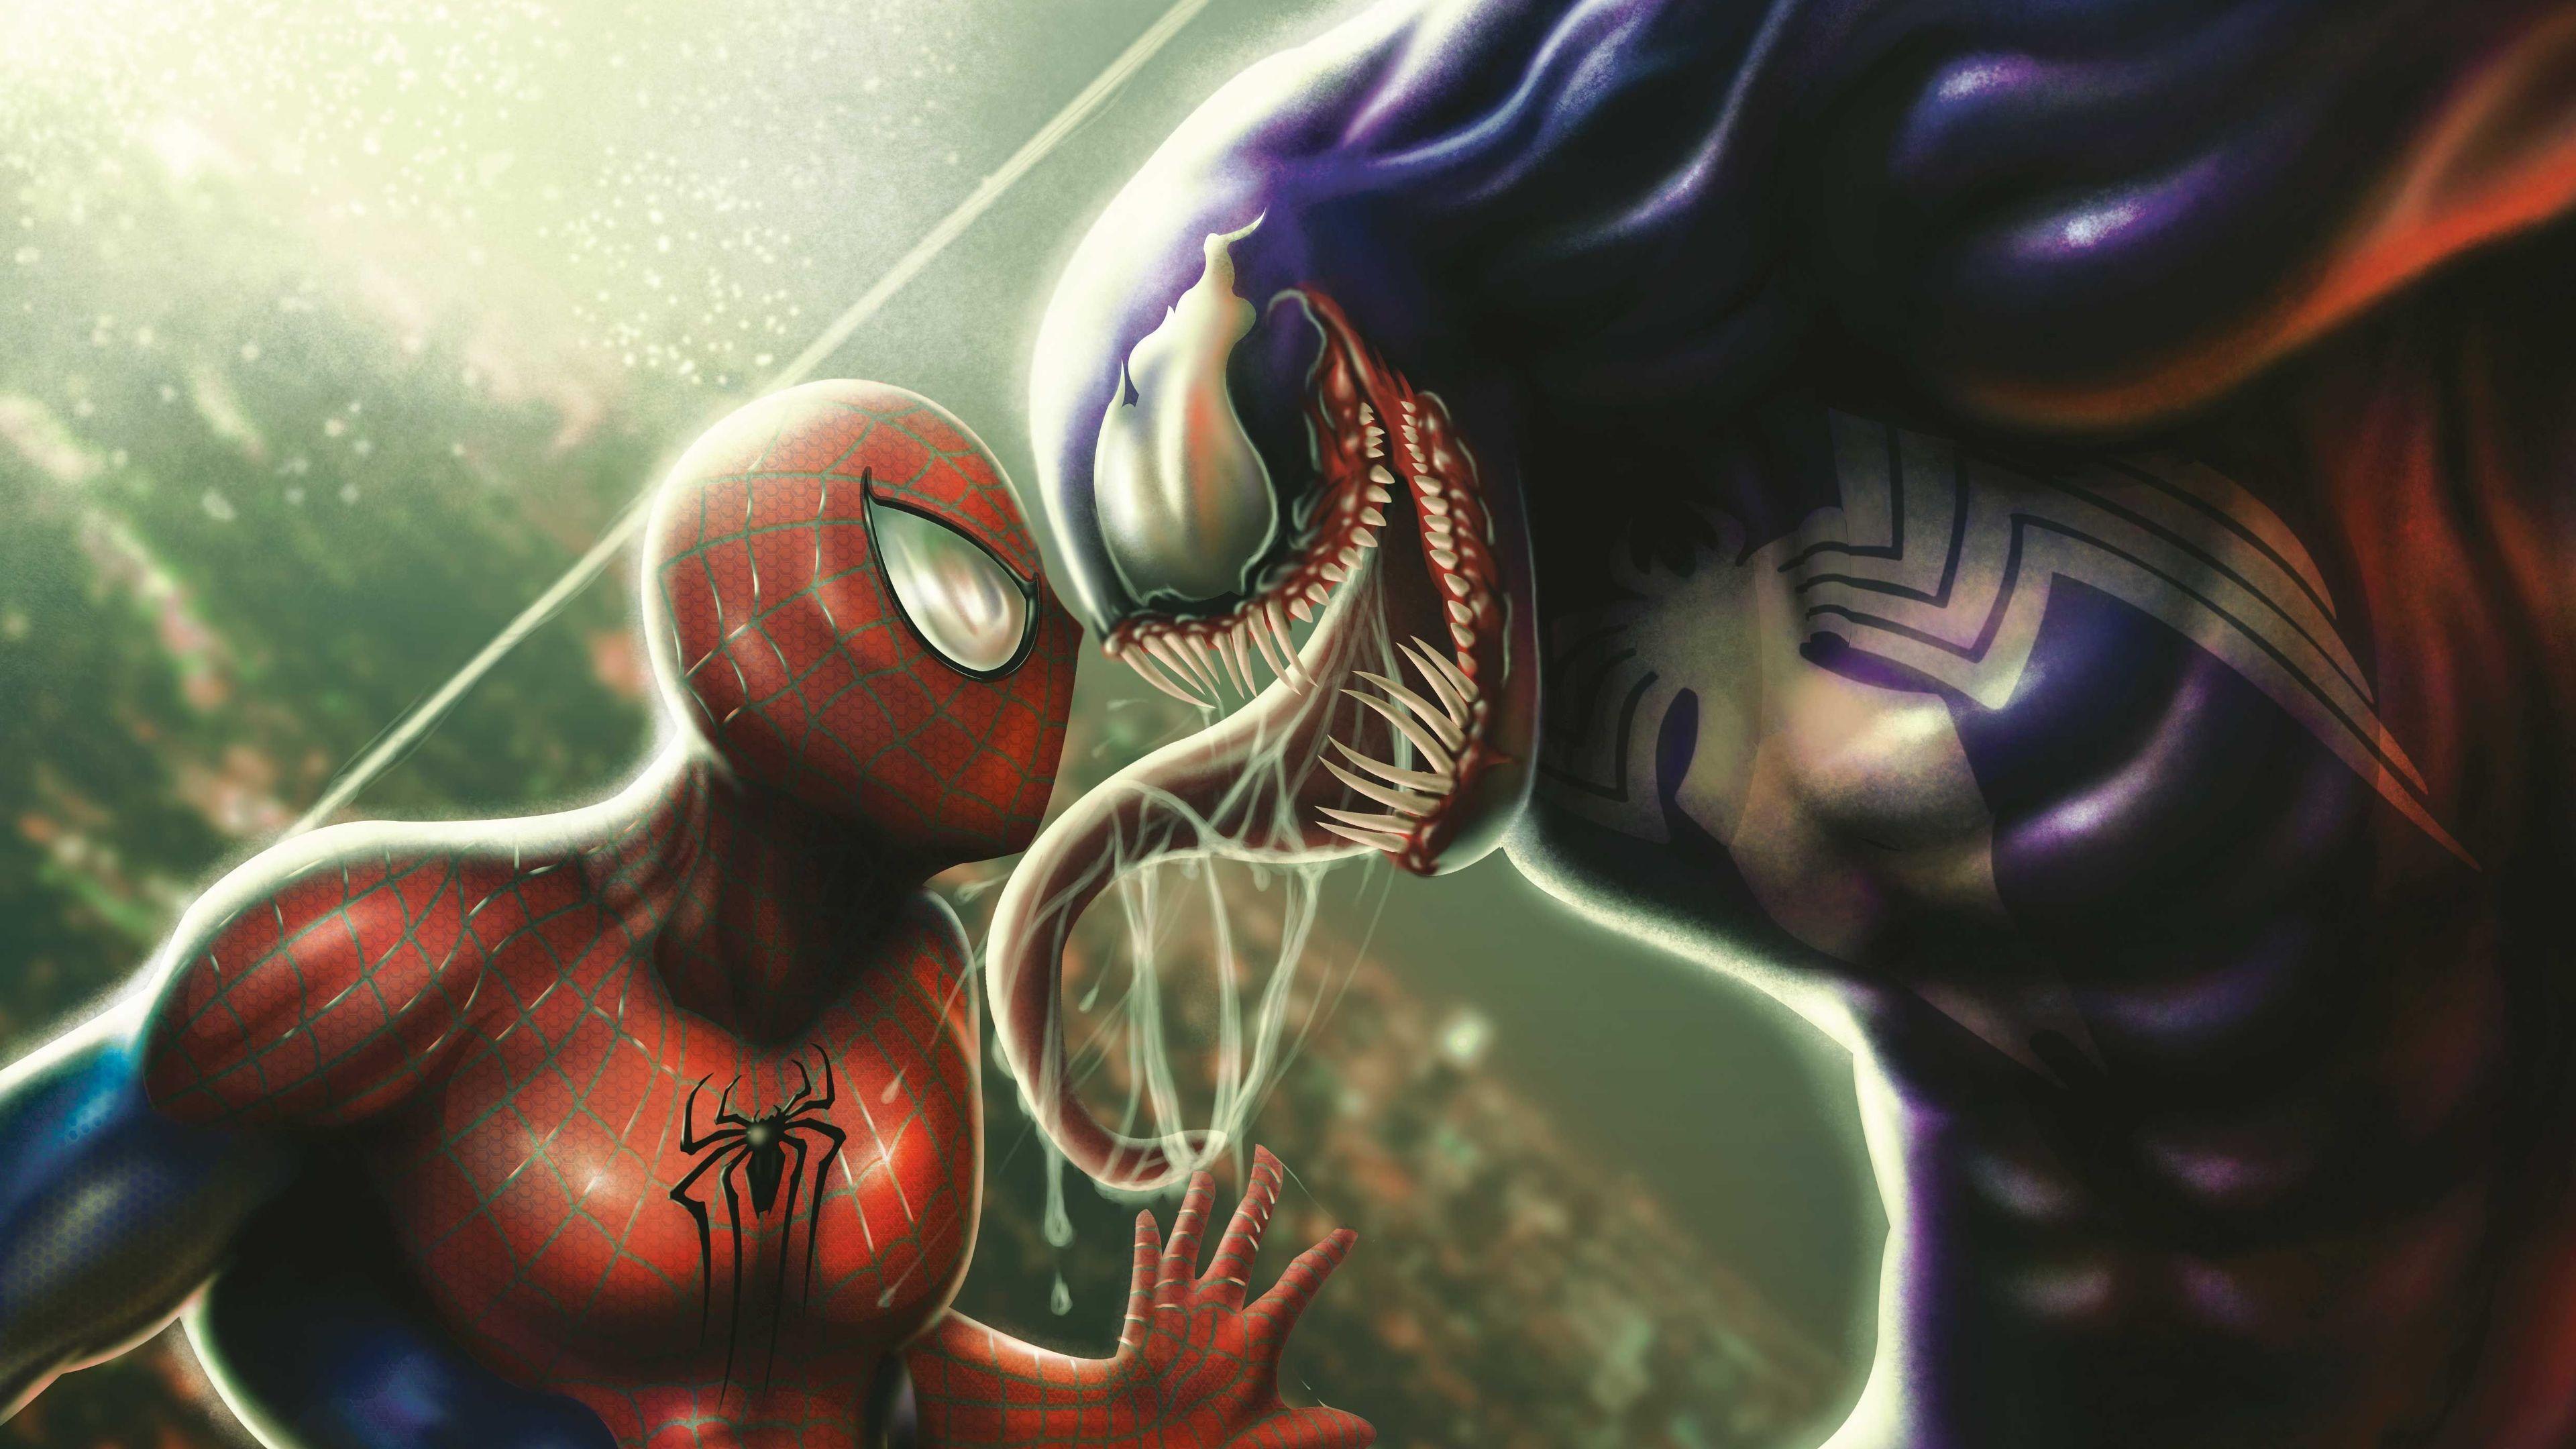 Spiderman And Venom 4k Venom wallpapers, superheroes